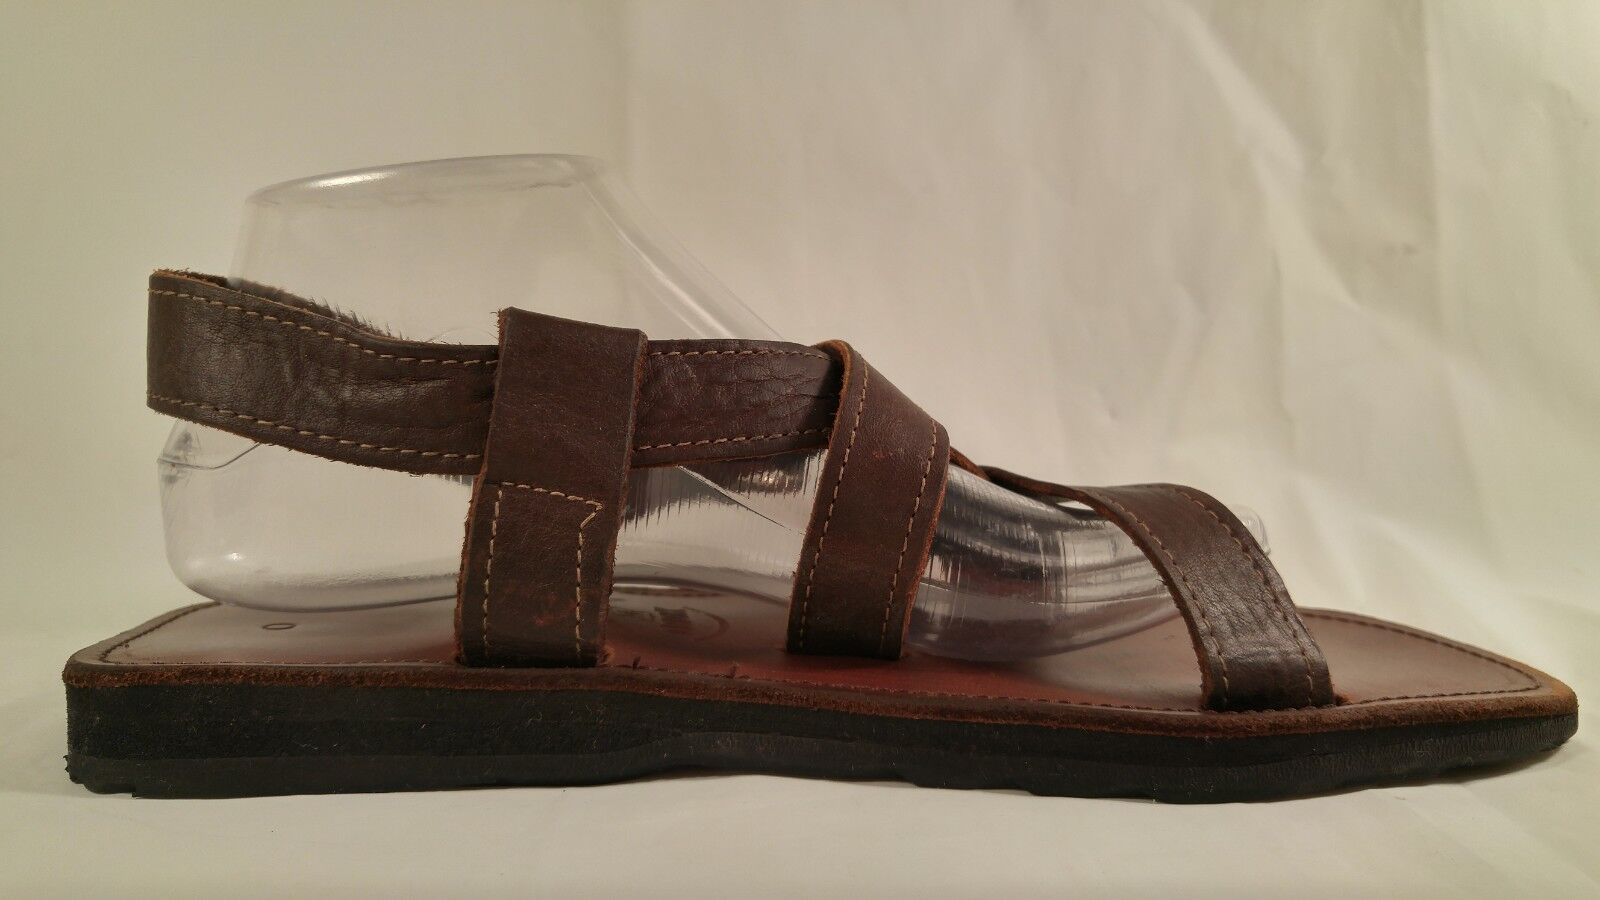 LNC LNC LNC goldx Pedro Brown Leather Handmade Strap Sport Sandal Men 9   Women 10 Apprx bcb2e1